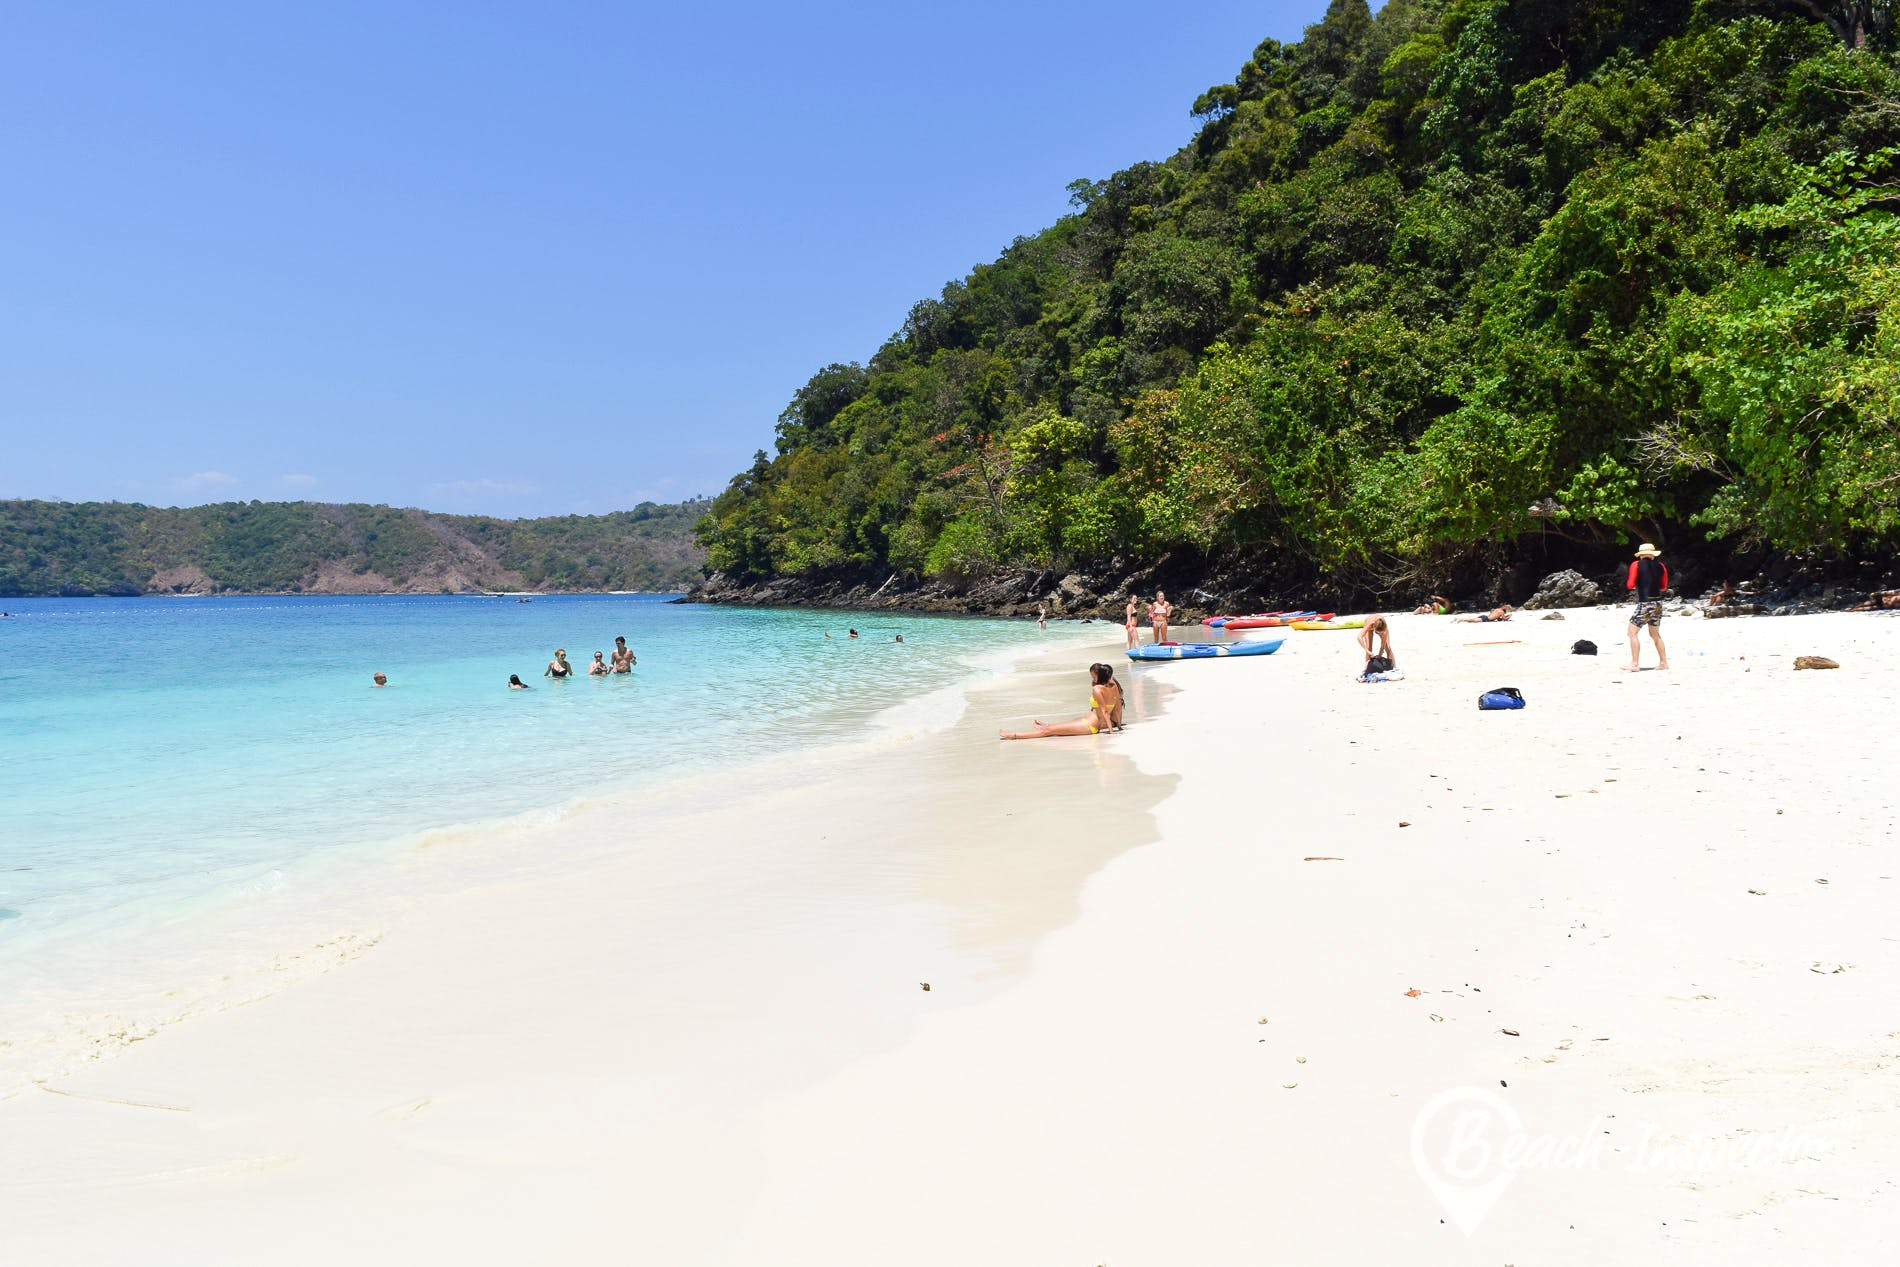 Beach Monkey Beach, Koh Phi Phi, Thailand